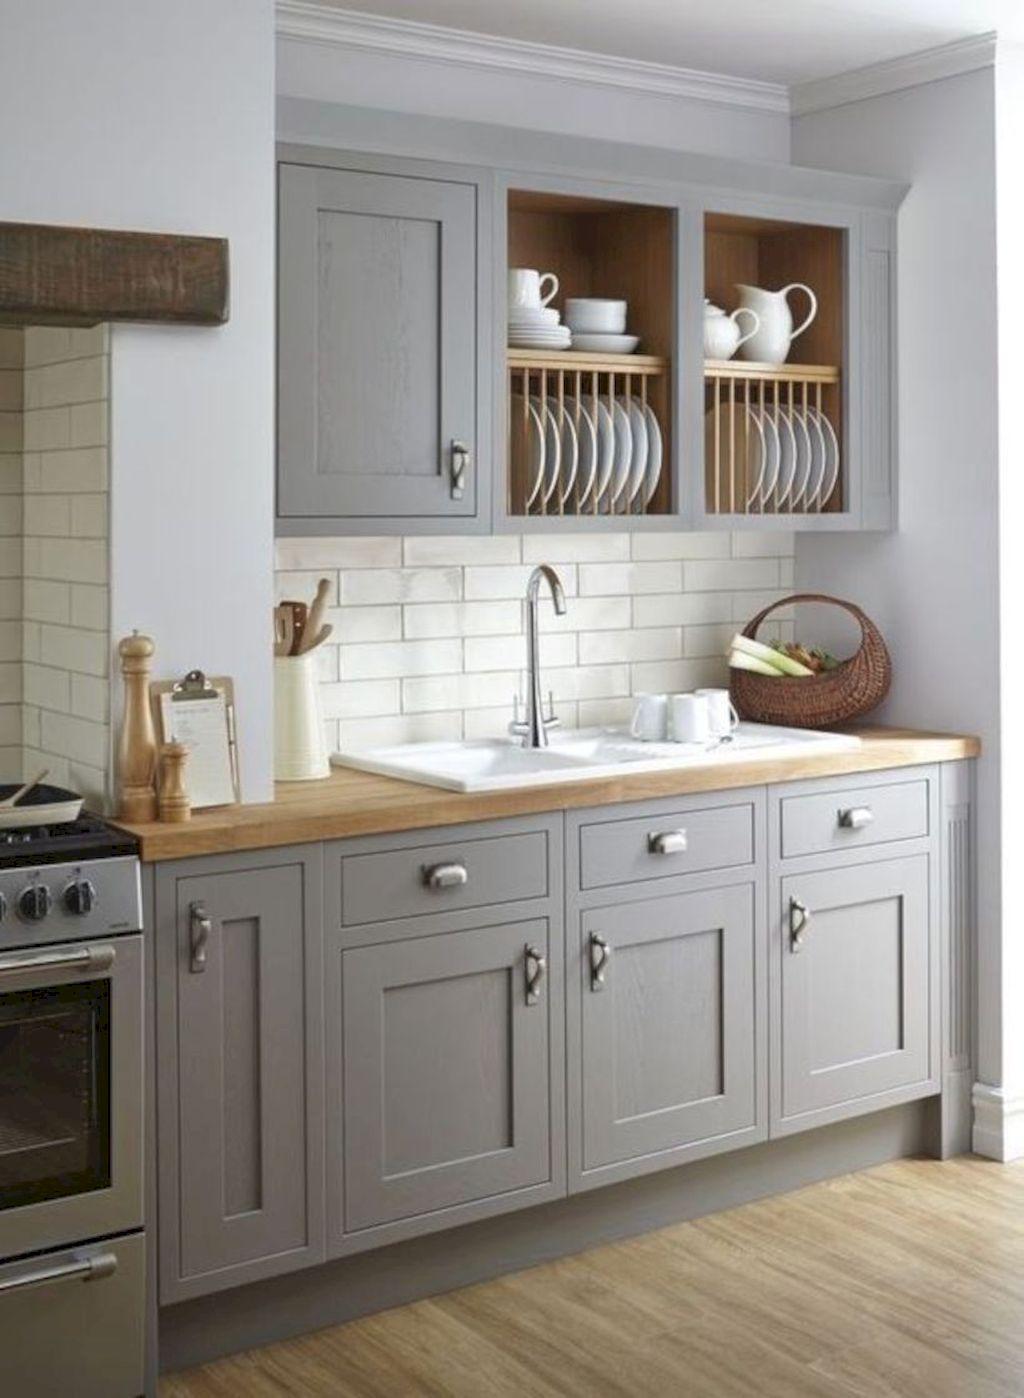 Gorgeous 50 Amazing Gray Kitchen Cabinet Design Ideas https://rusticroom.co/1535/50-amazing-gray-kitchen-cabinet-design-ideas